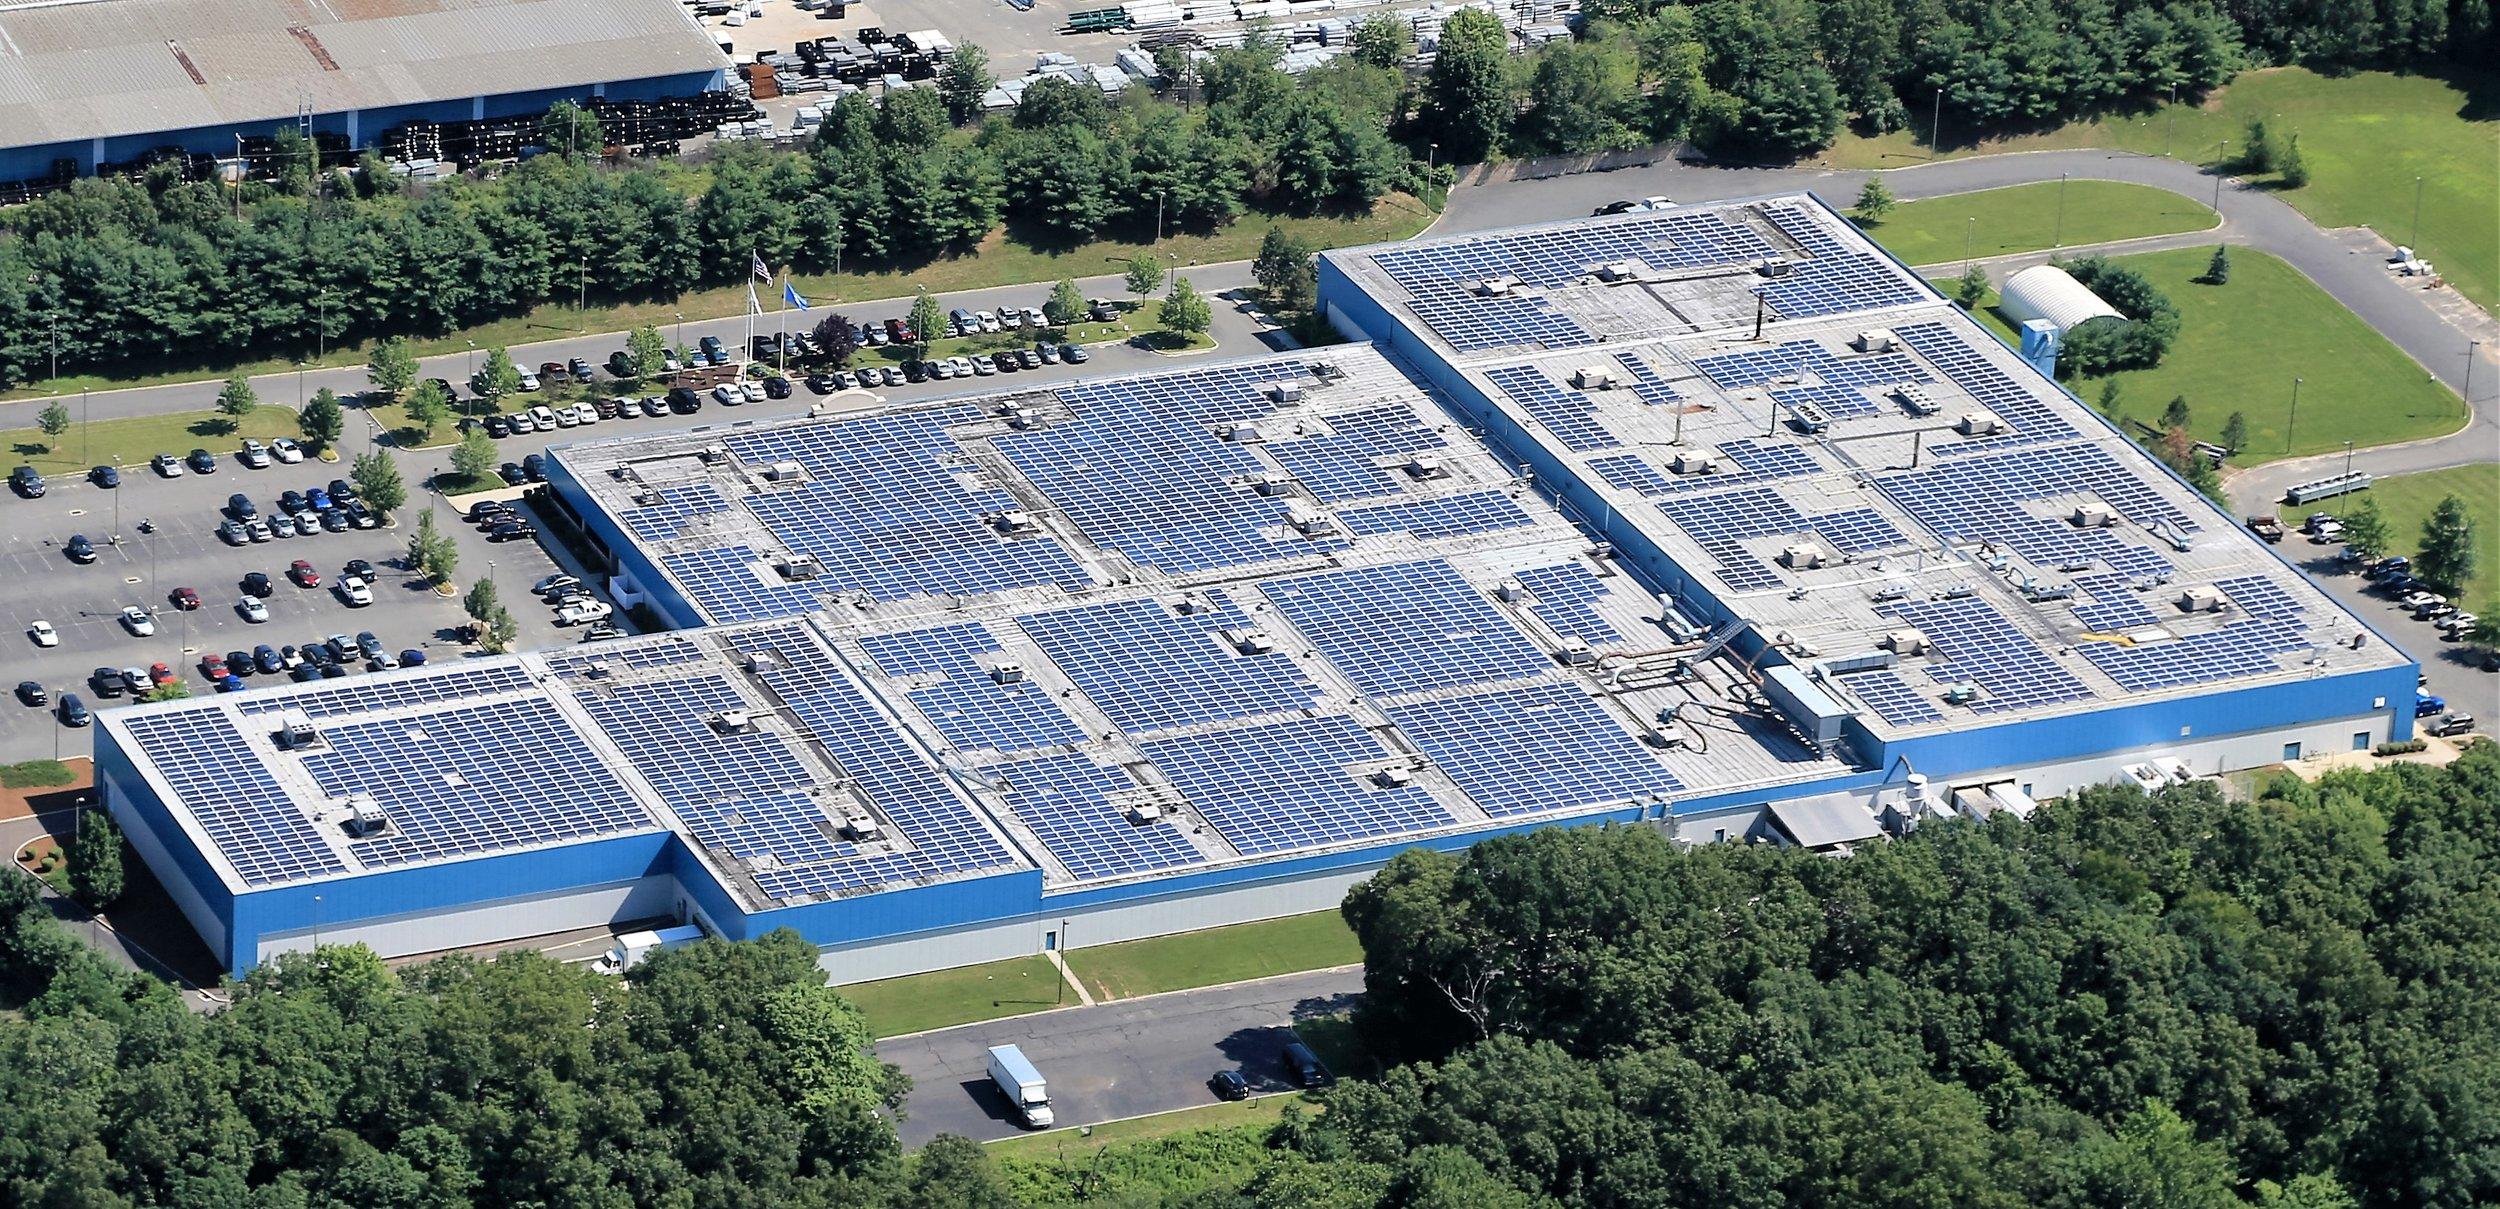 allied-printing-solar-system.jpg